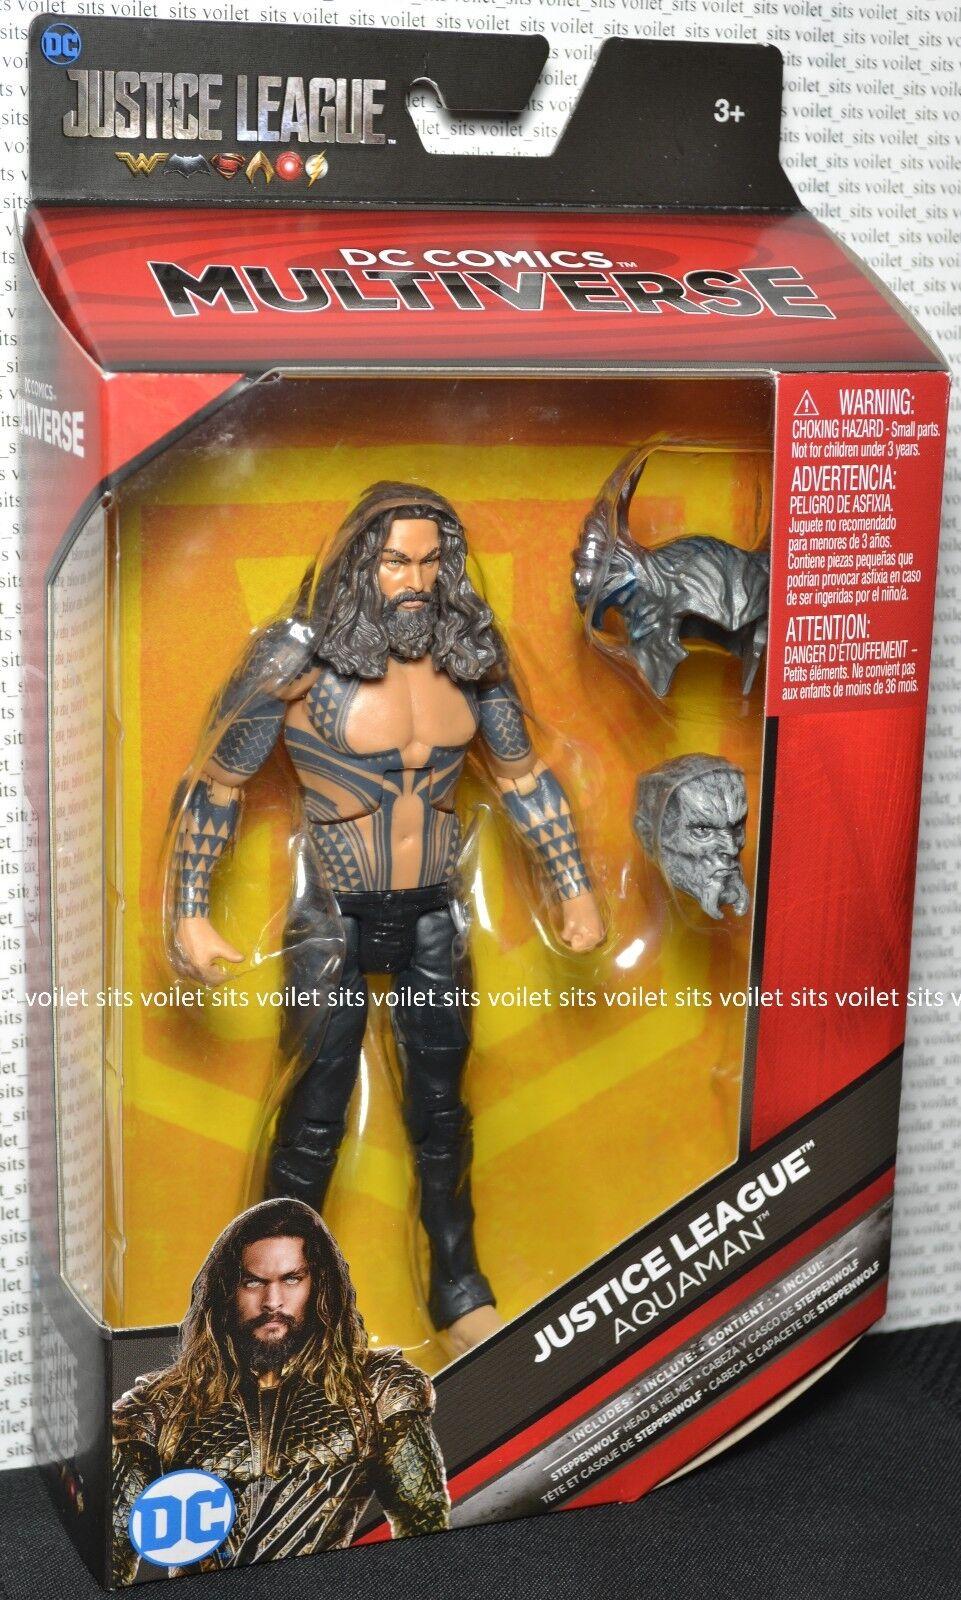 DC Comics Multiverse Collect Steppenwolf Justice League Exclusive Figure Aquaman